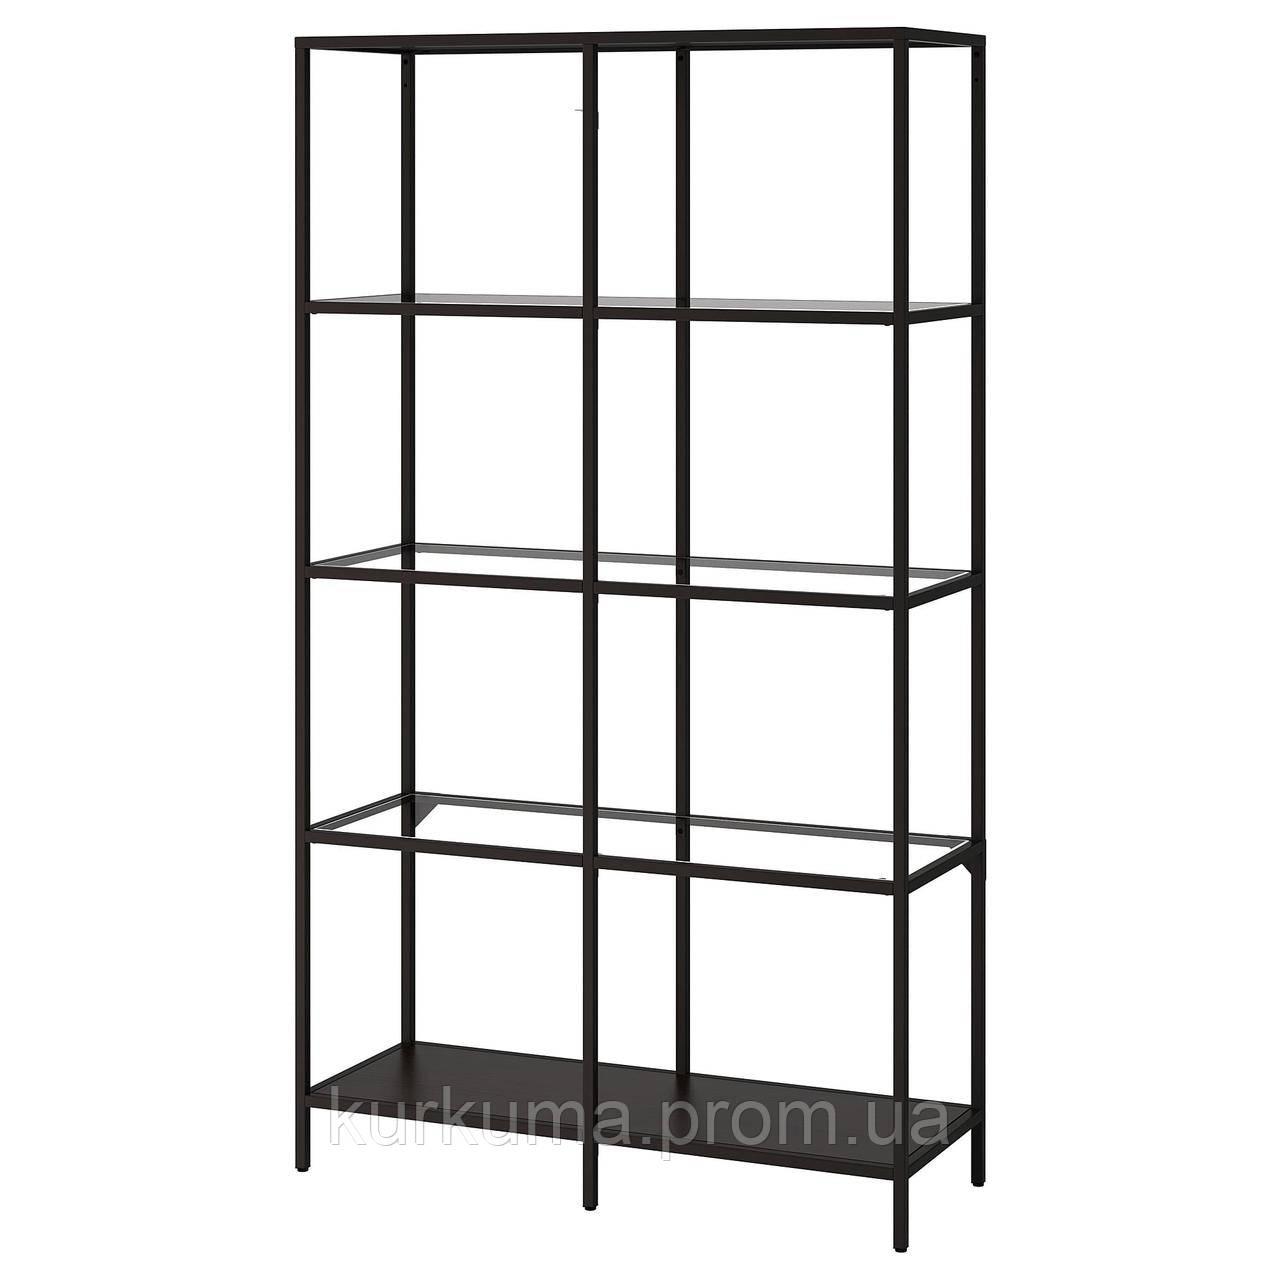 IKEA VITTSJO Стеллаж, черно-коричневый, стекло  (202.133.12)